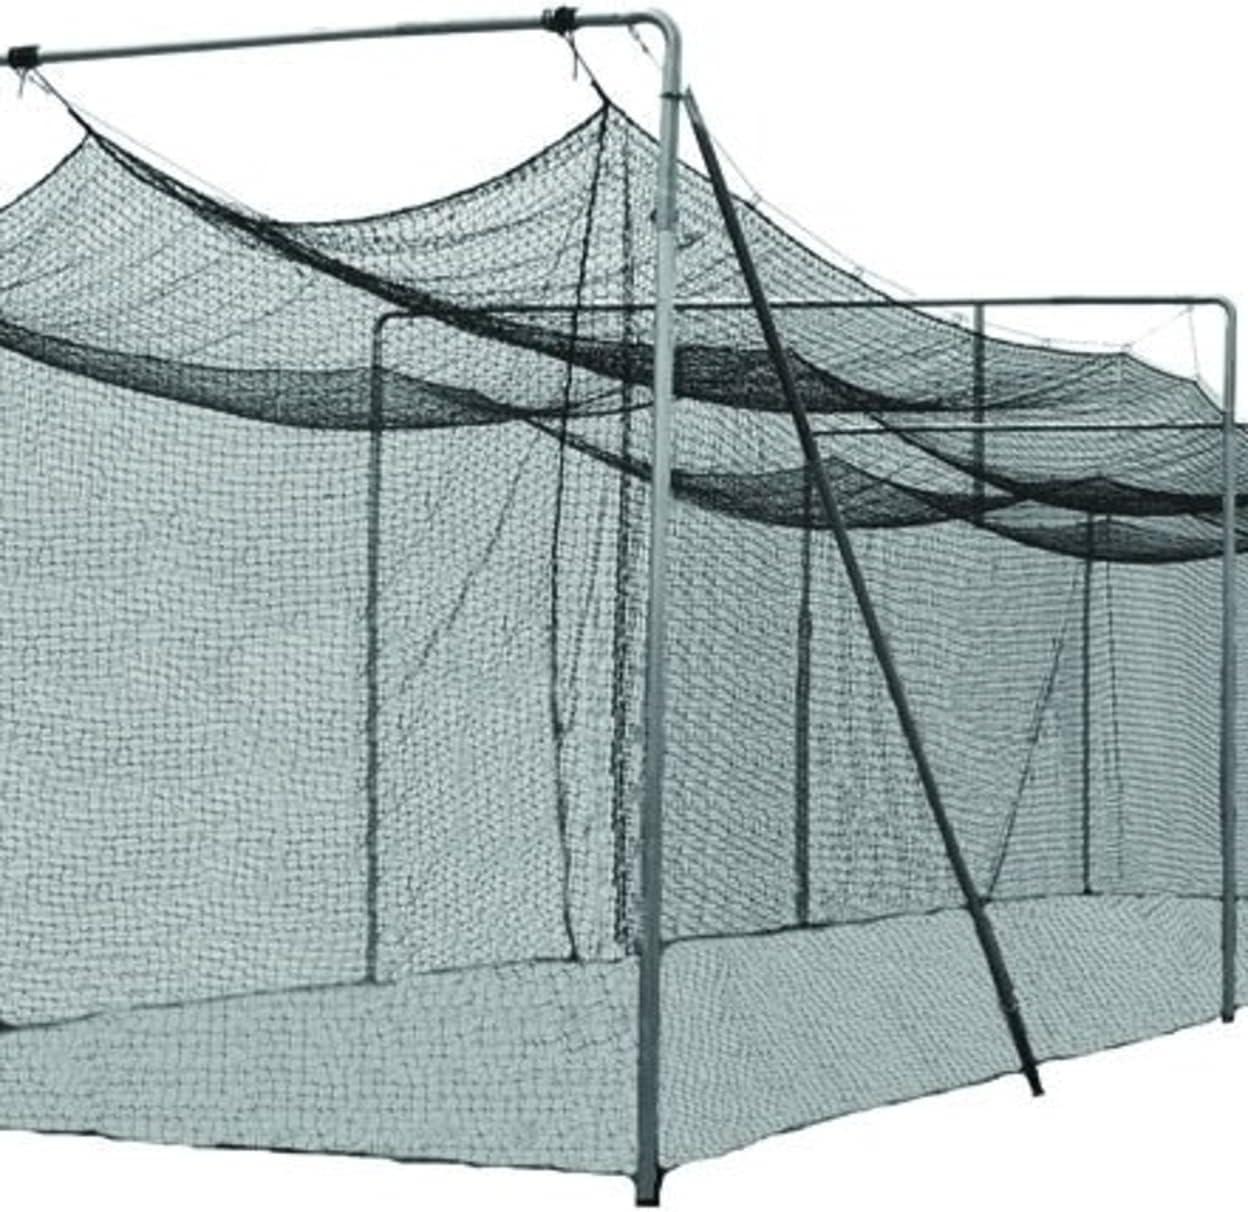 New Cimarron 30X12X10  #24 Twisted Poly Batting Cage Net